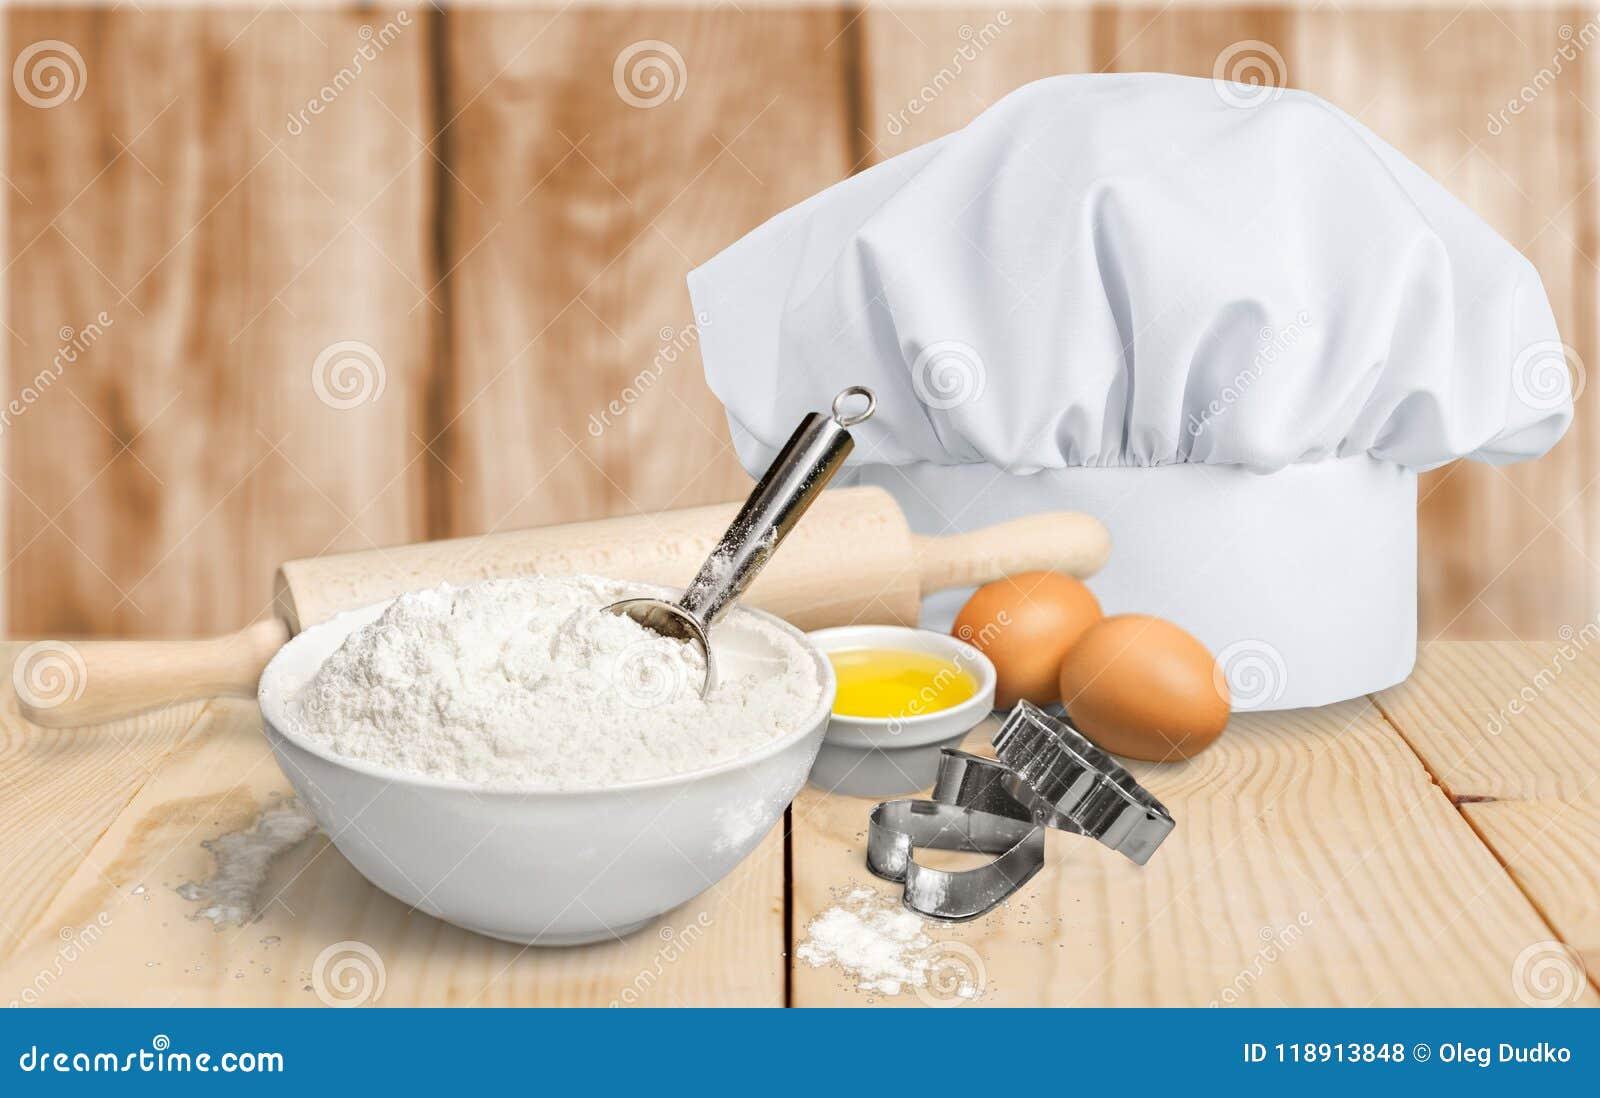 Chef`s hat